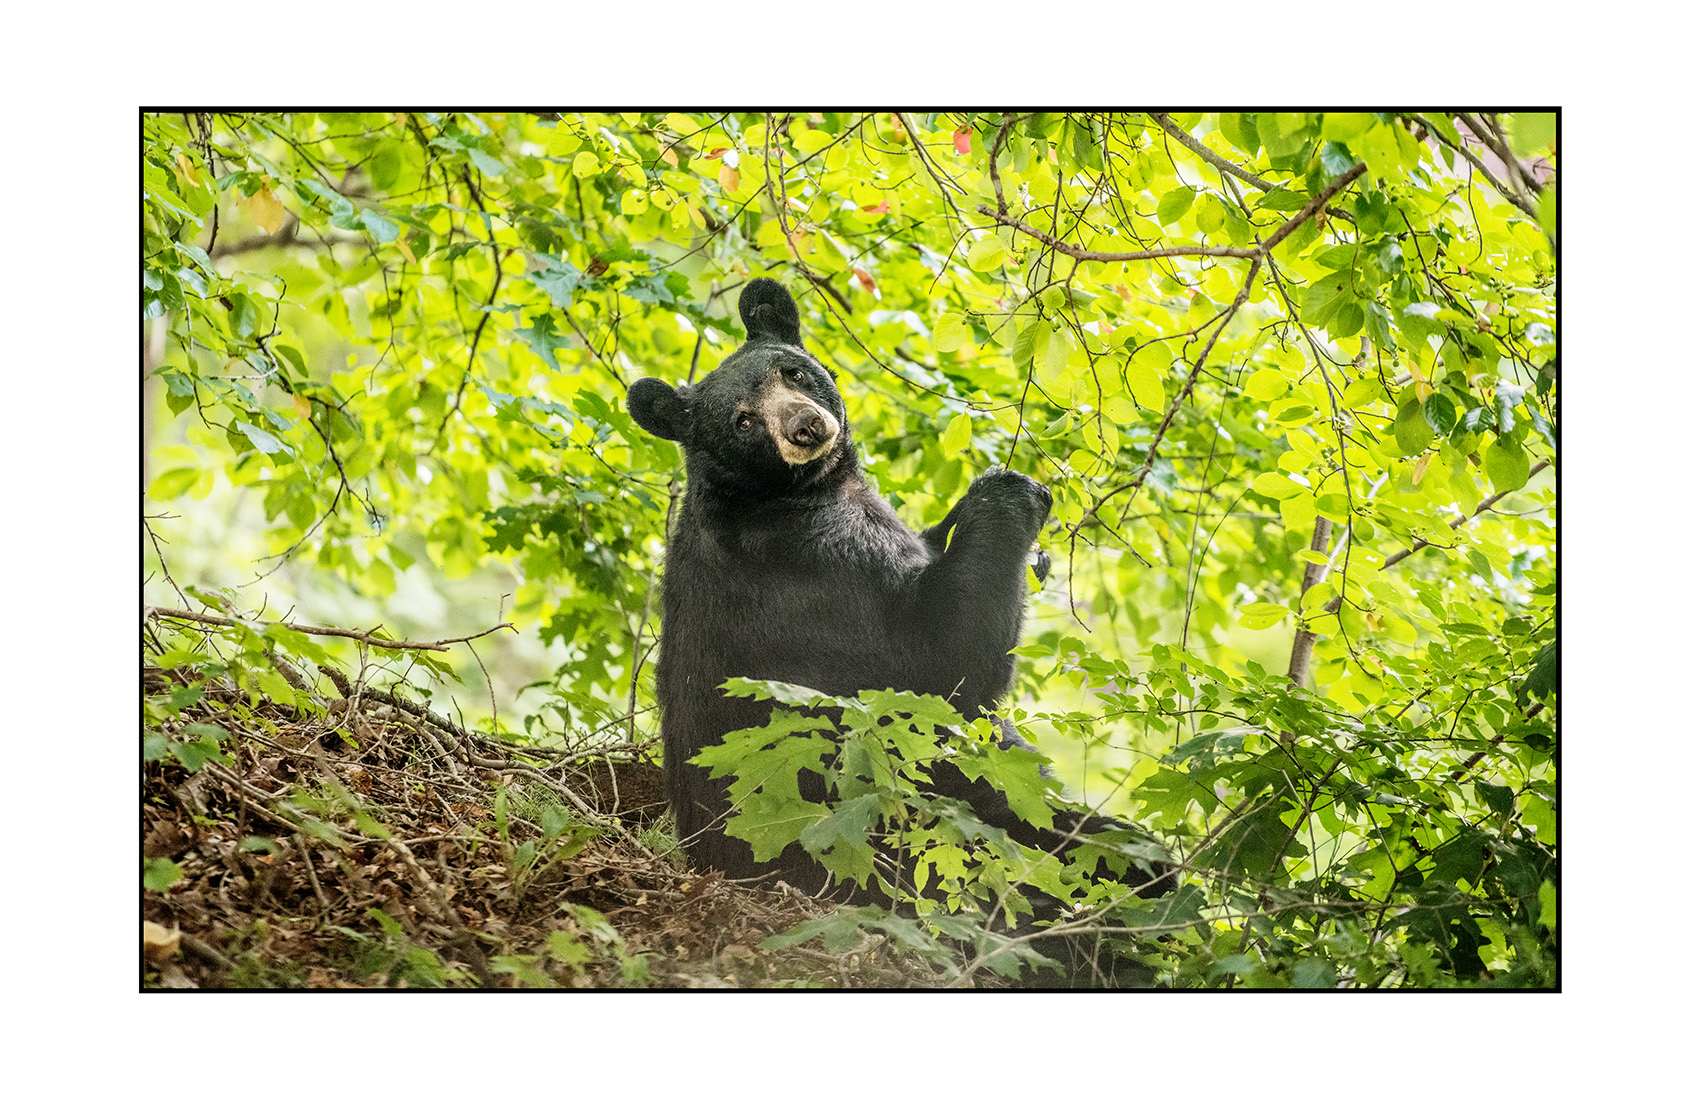 Black Bear Snacking